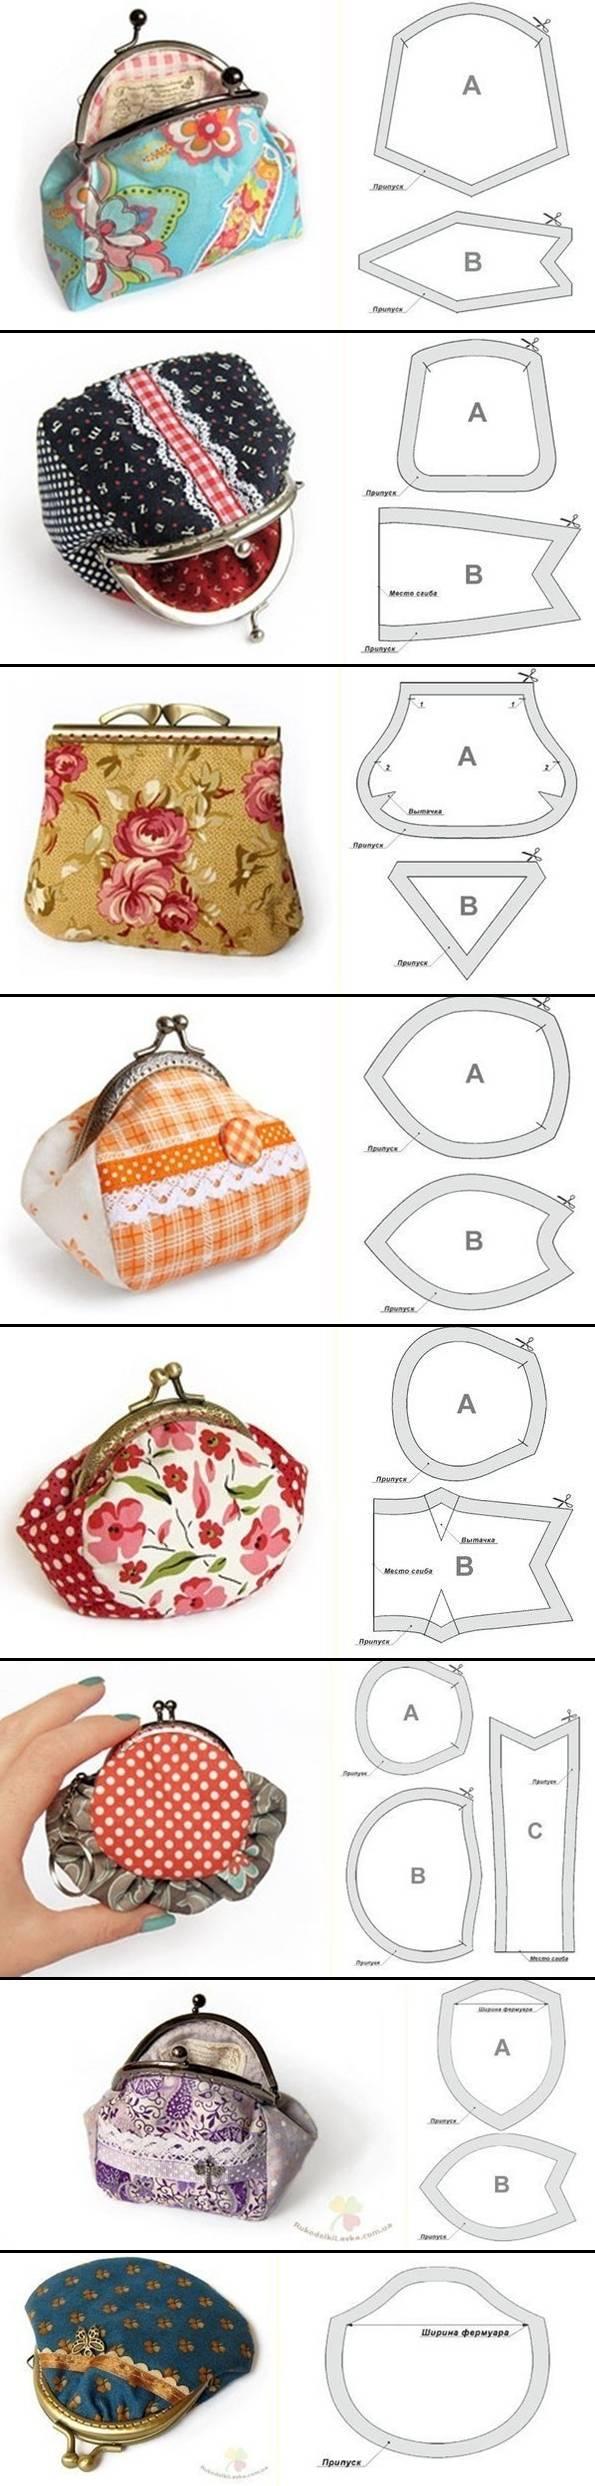 DIY-Cute-Purse-Templates.jpg